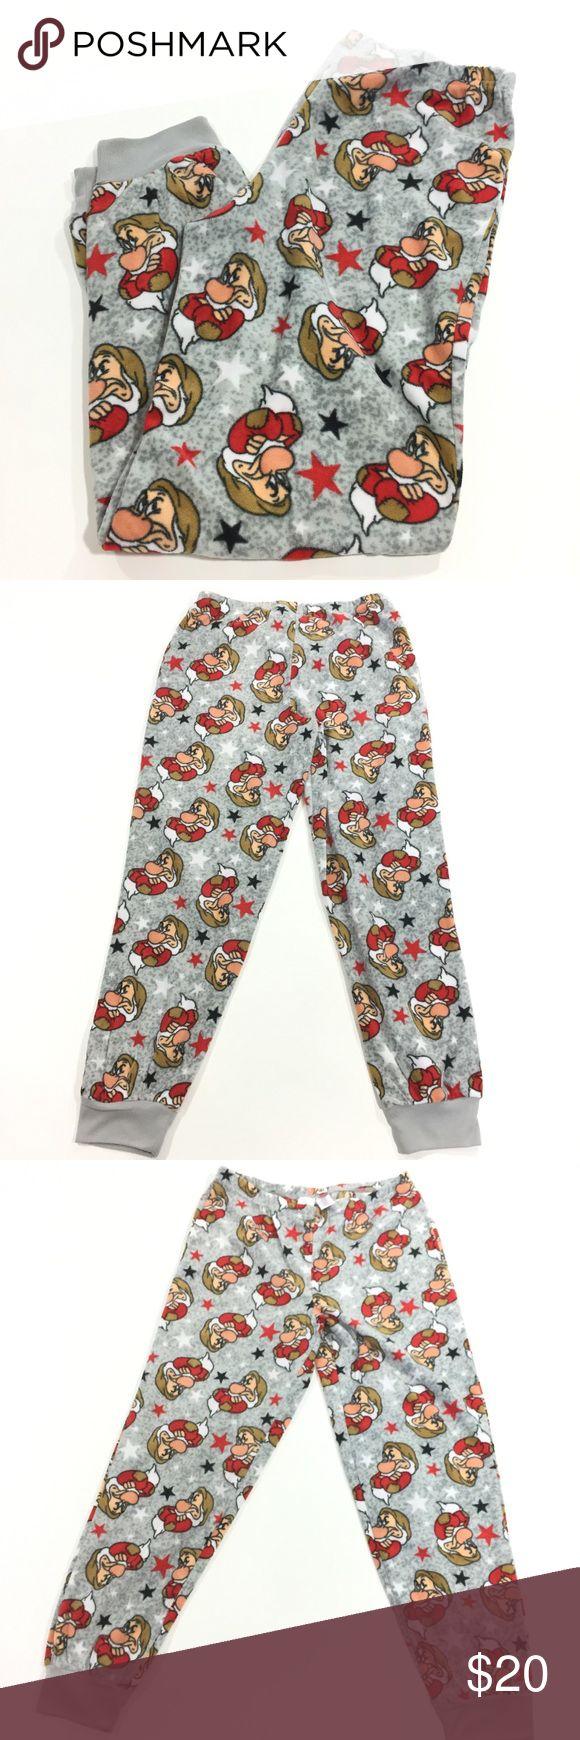 "Disney Size Small Fleece Pajama Pants NWOT ""Grumpy"" Snow White and the Seven Dwarves  Pajama Fleece Pants Gray. Size Small Measurements in Pictures Disney Intimates & Sleepwear Pajamas"